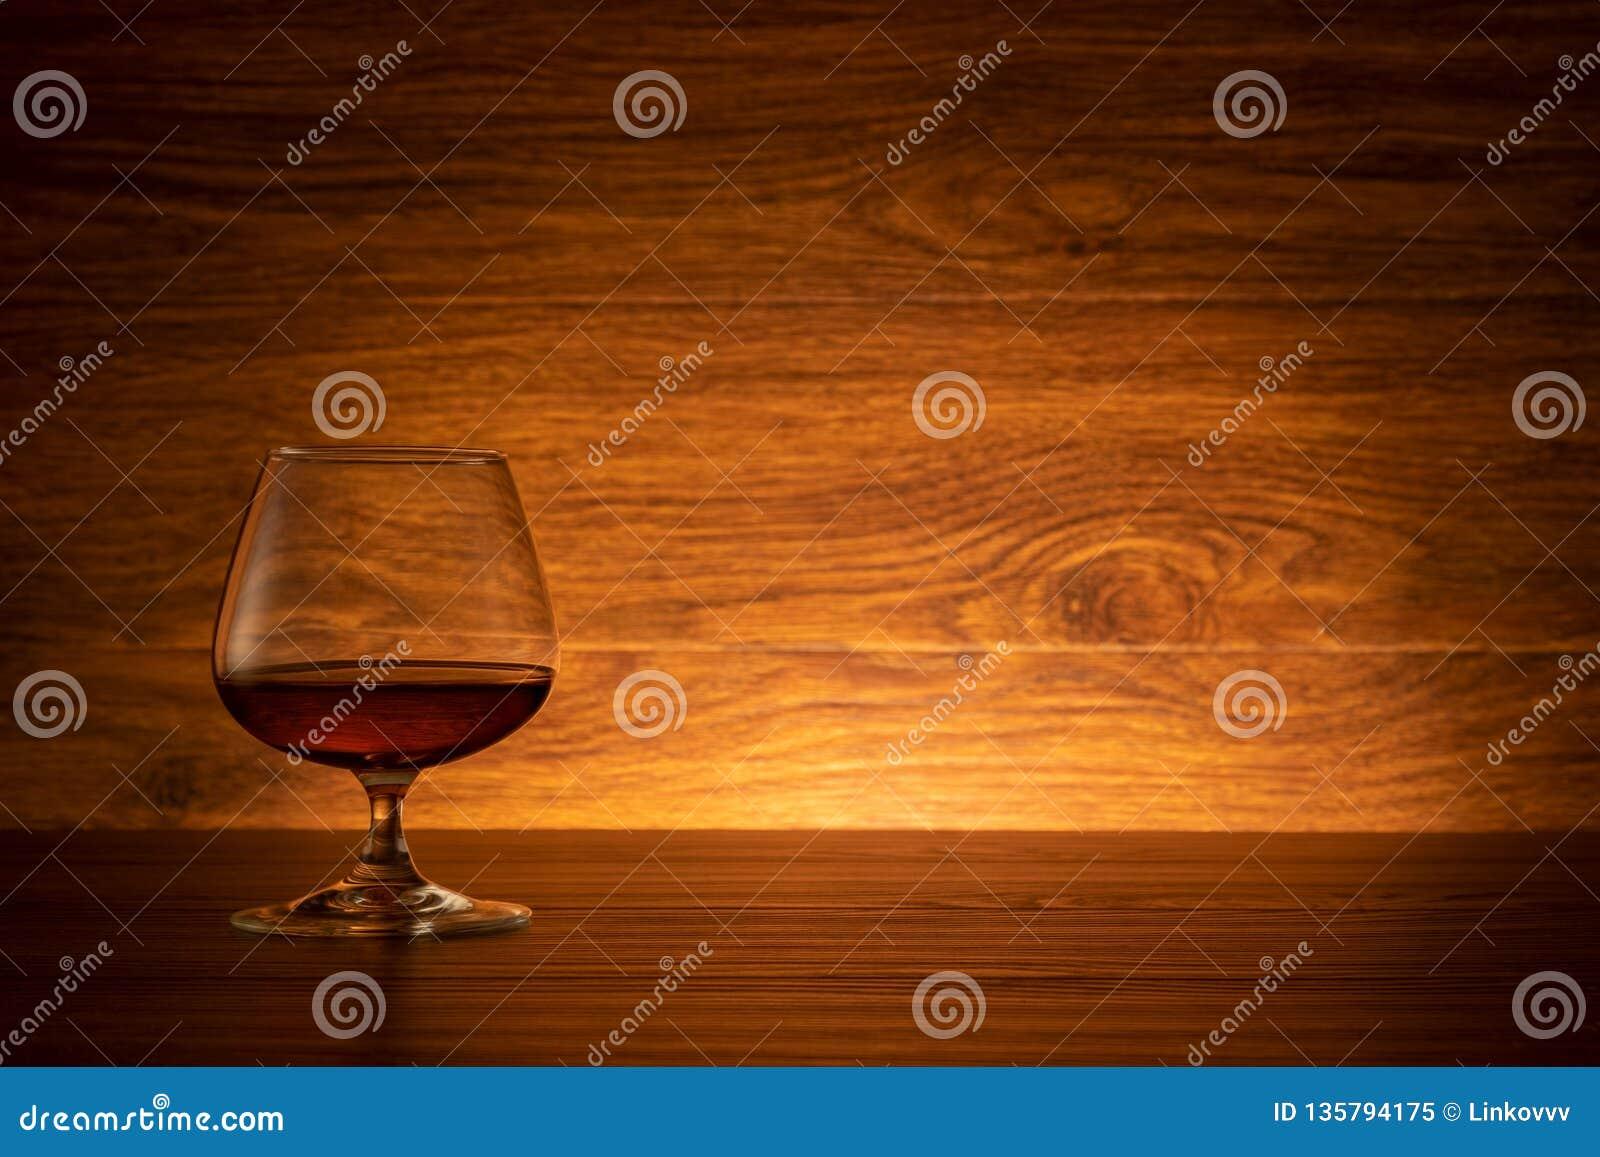 Brandy wine glass on wooden background